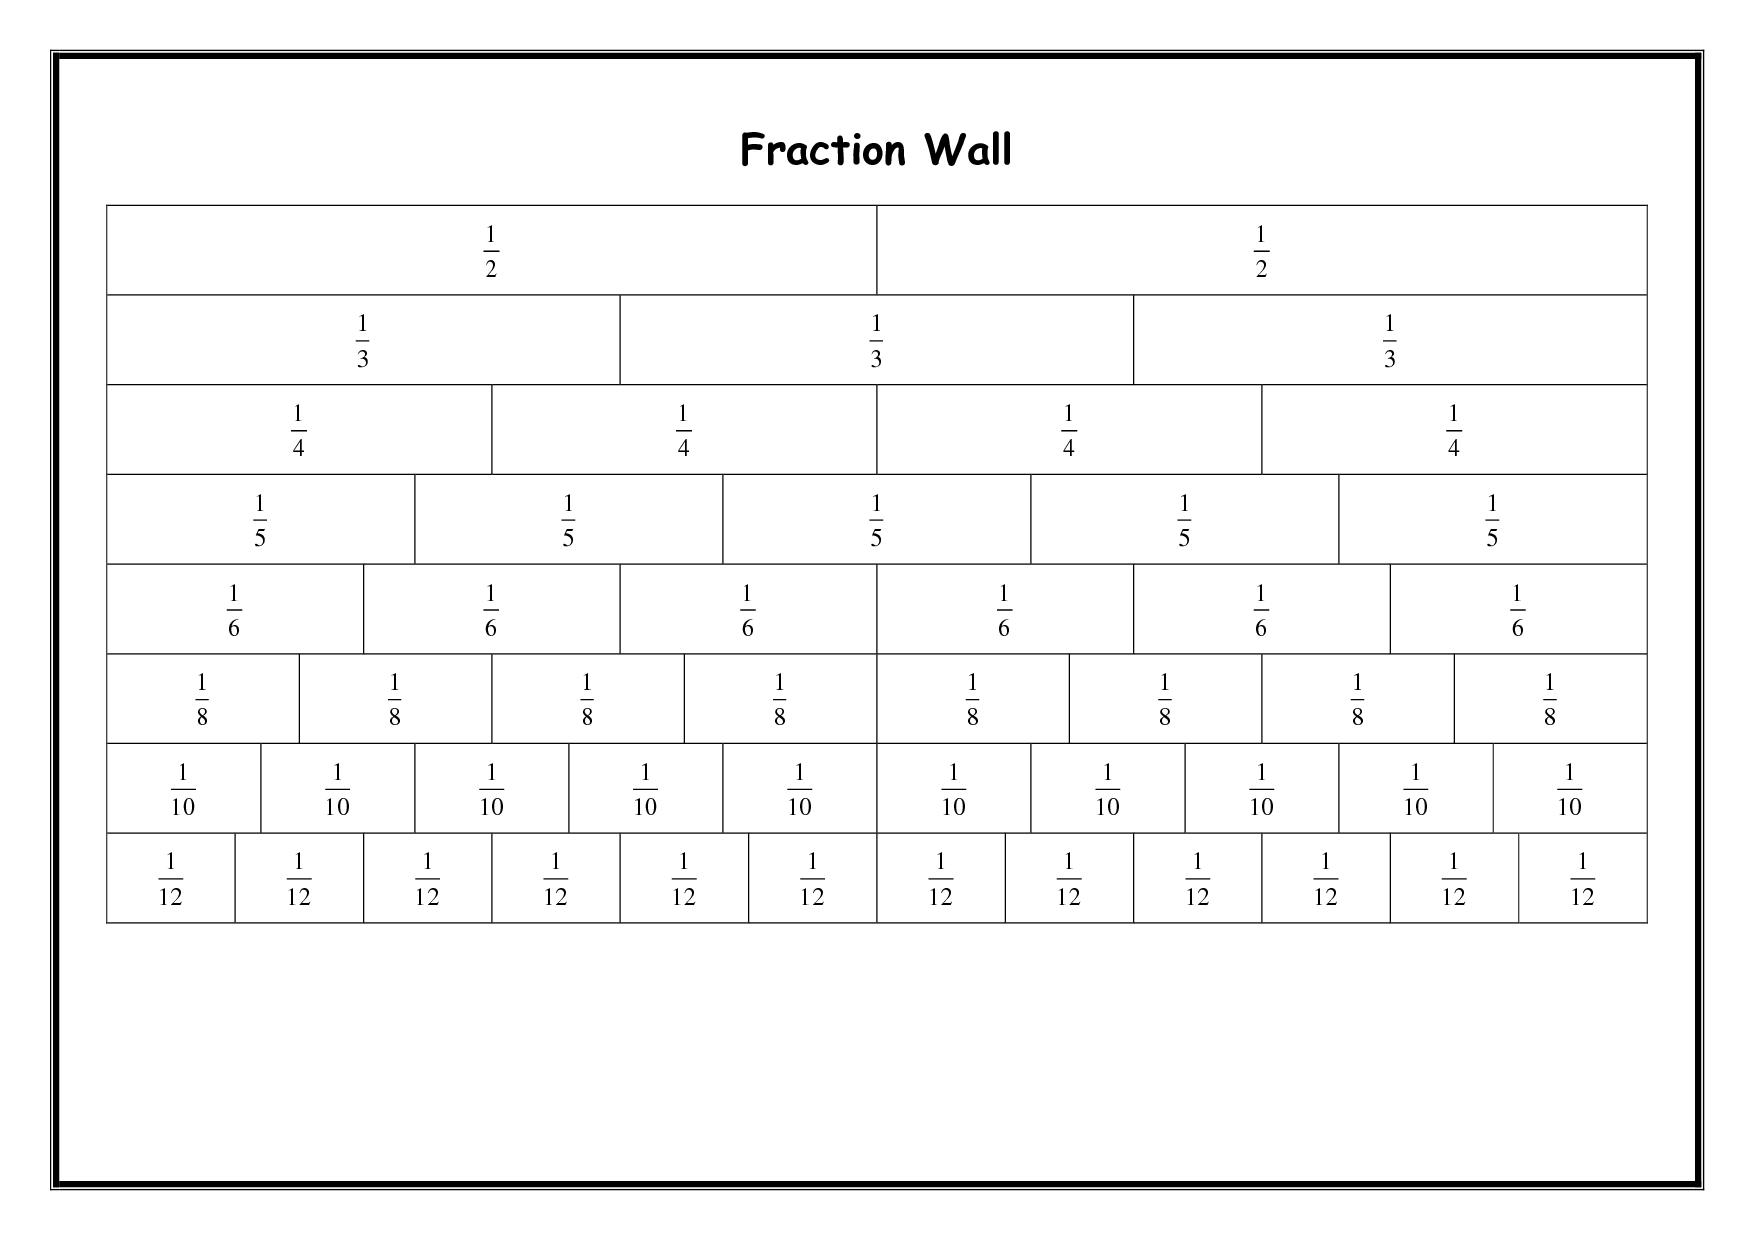 Post_printable Fraction Wall_286022 on Number Line Worksheets